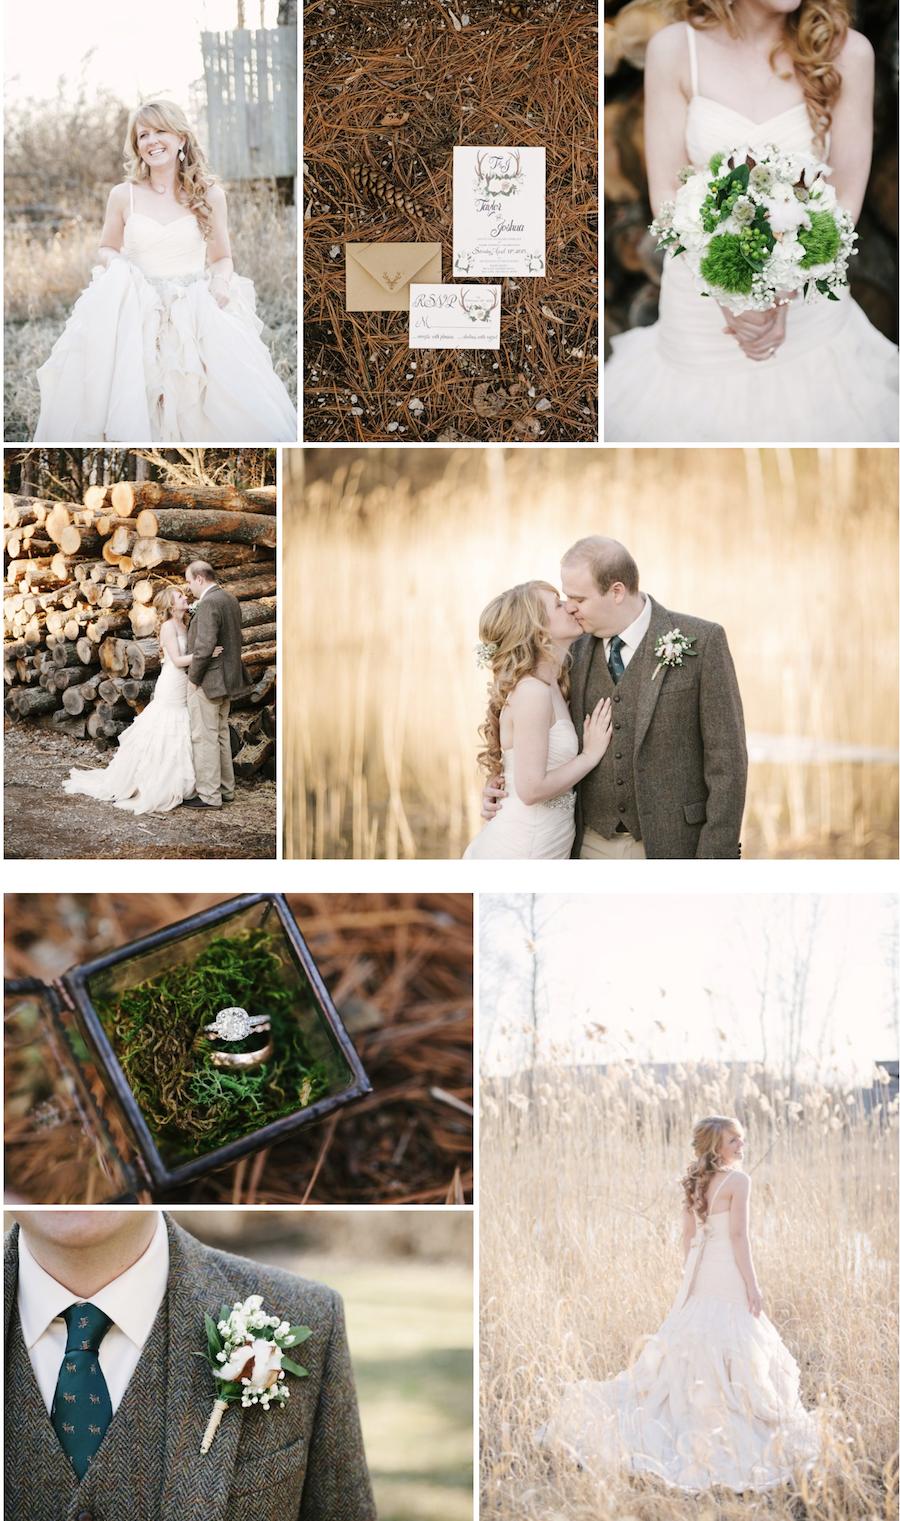 Taylor And Joshuas Woodland Deer Themed Rustic Wedding Via Love Inc